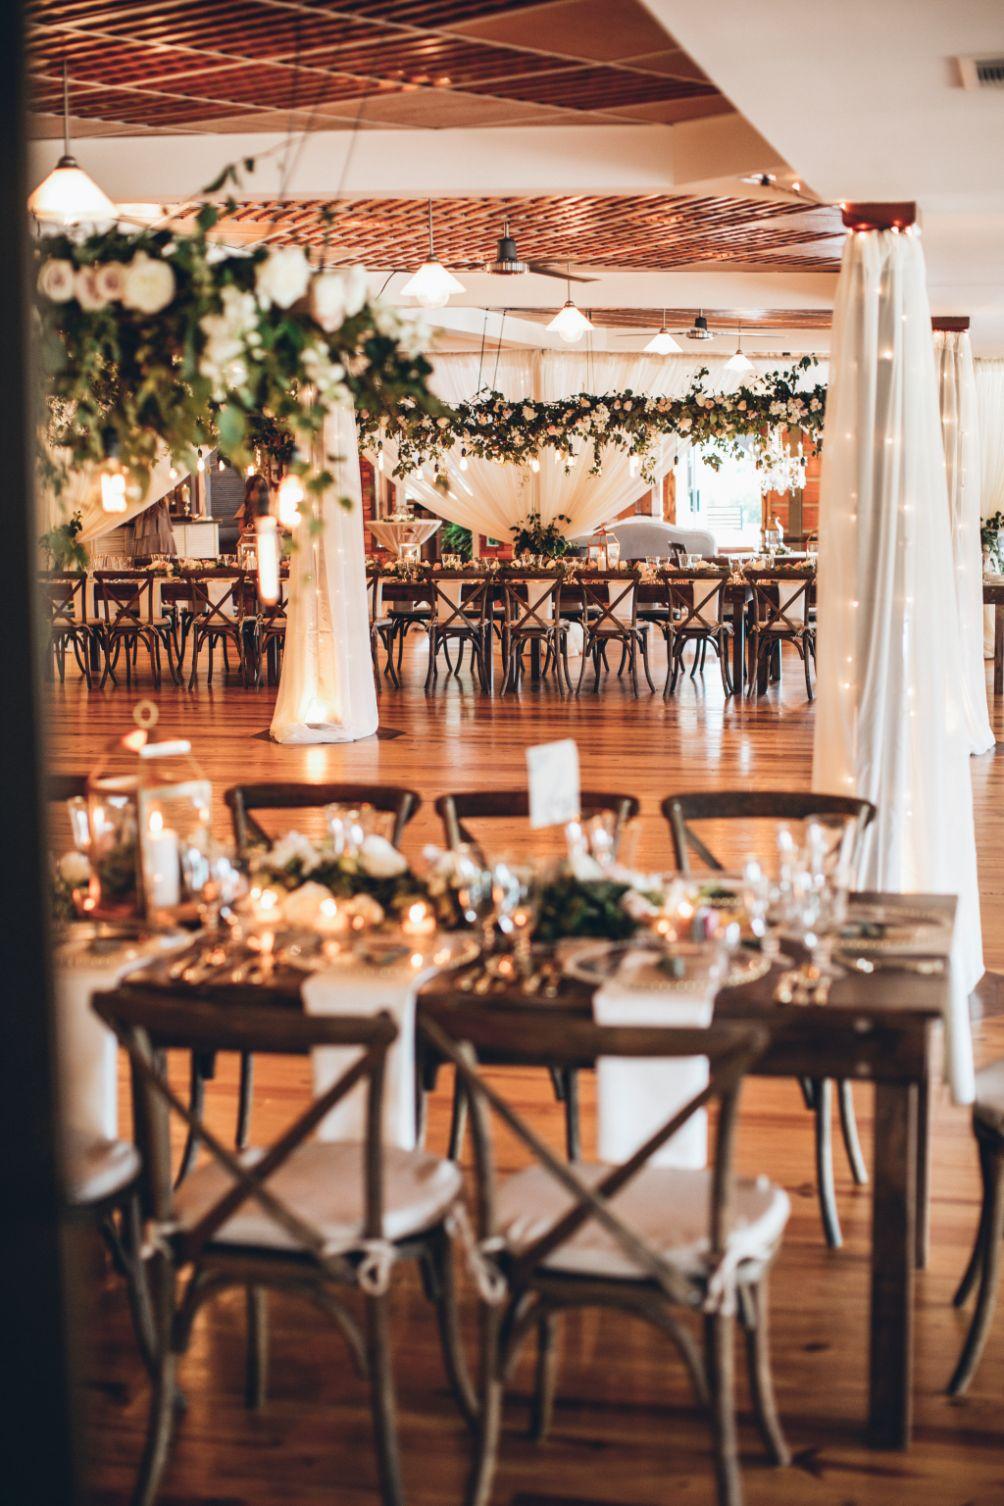 O00 Photos2017Iman Alodah 7.17.17 Miss Alysse Wedding Photography 72 nashville wedding venue lebanon tn tennessee wedding venue rustic overnight stay catering 1